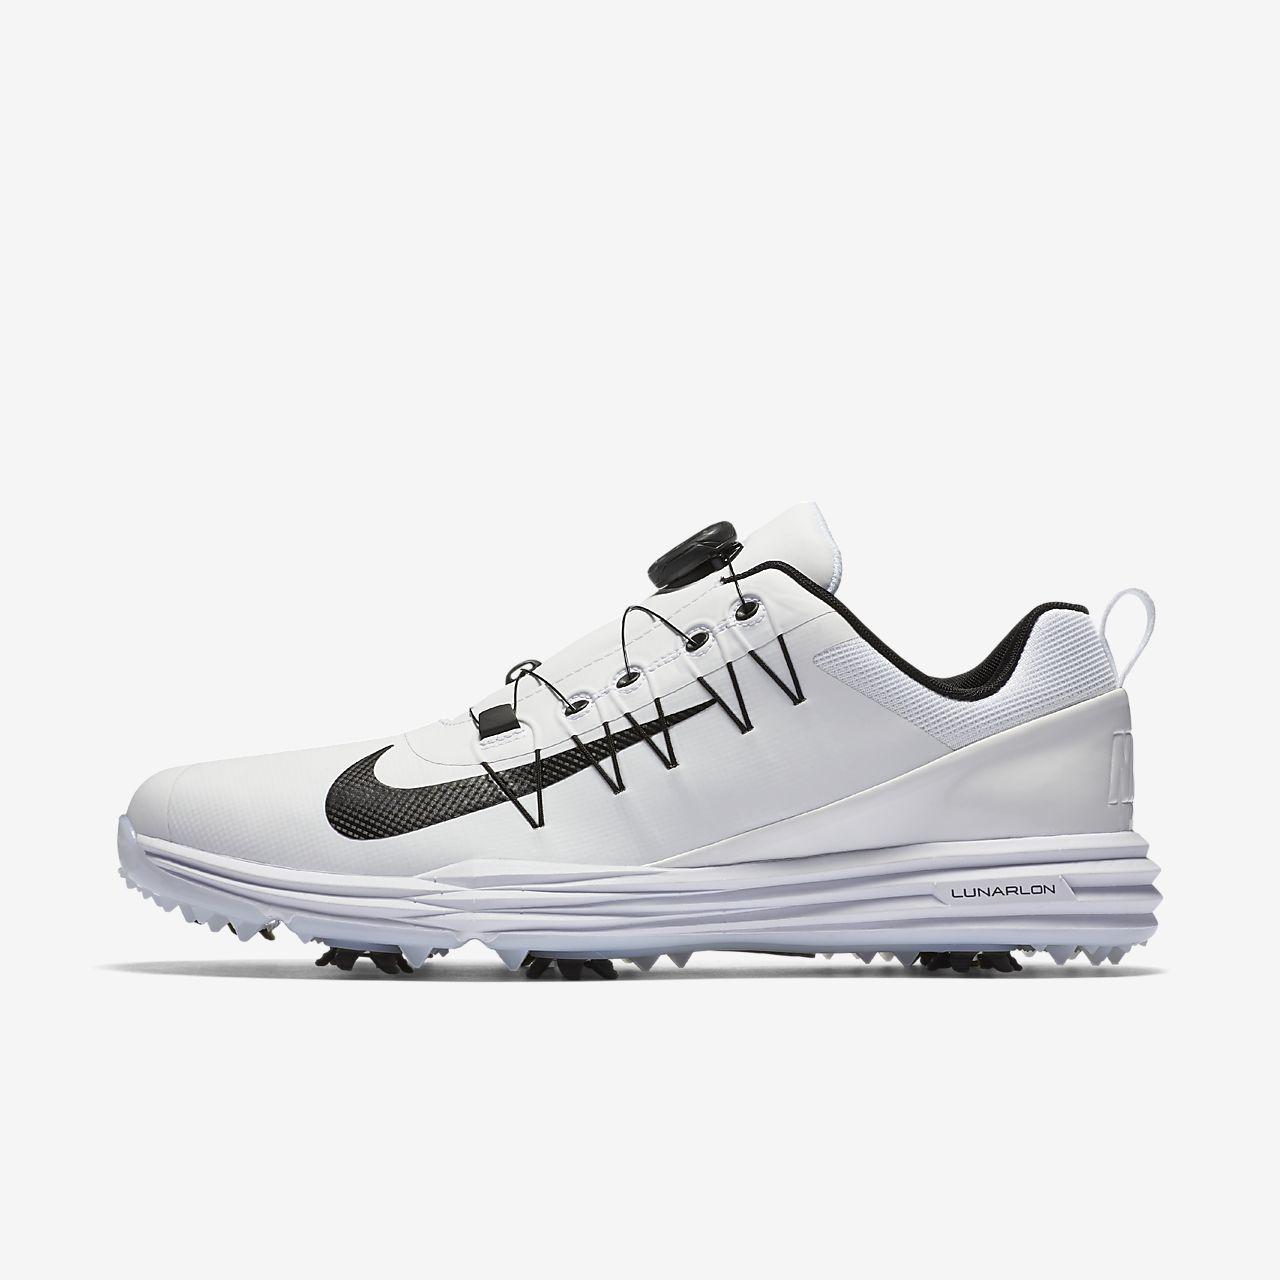 ... Nike Lunar Command 2 BOA Herren-Golfschuh